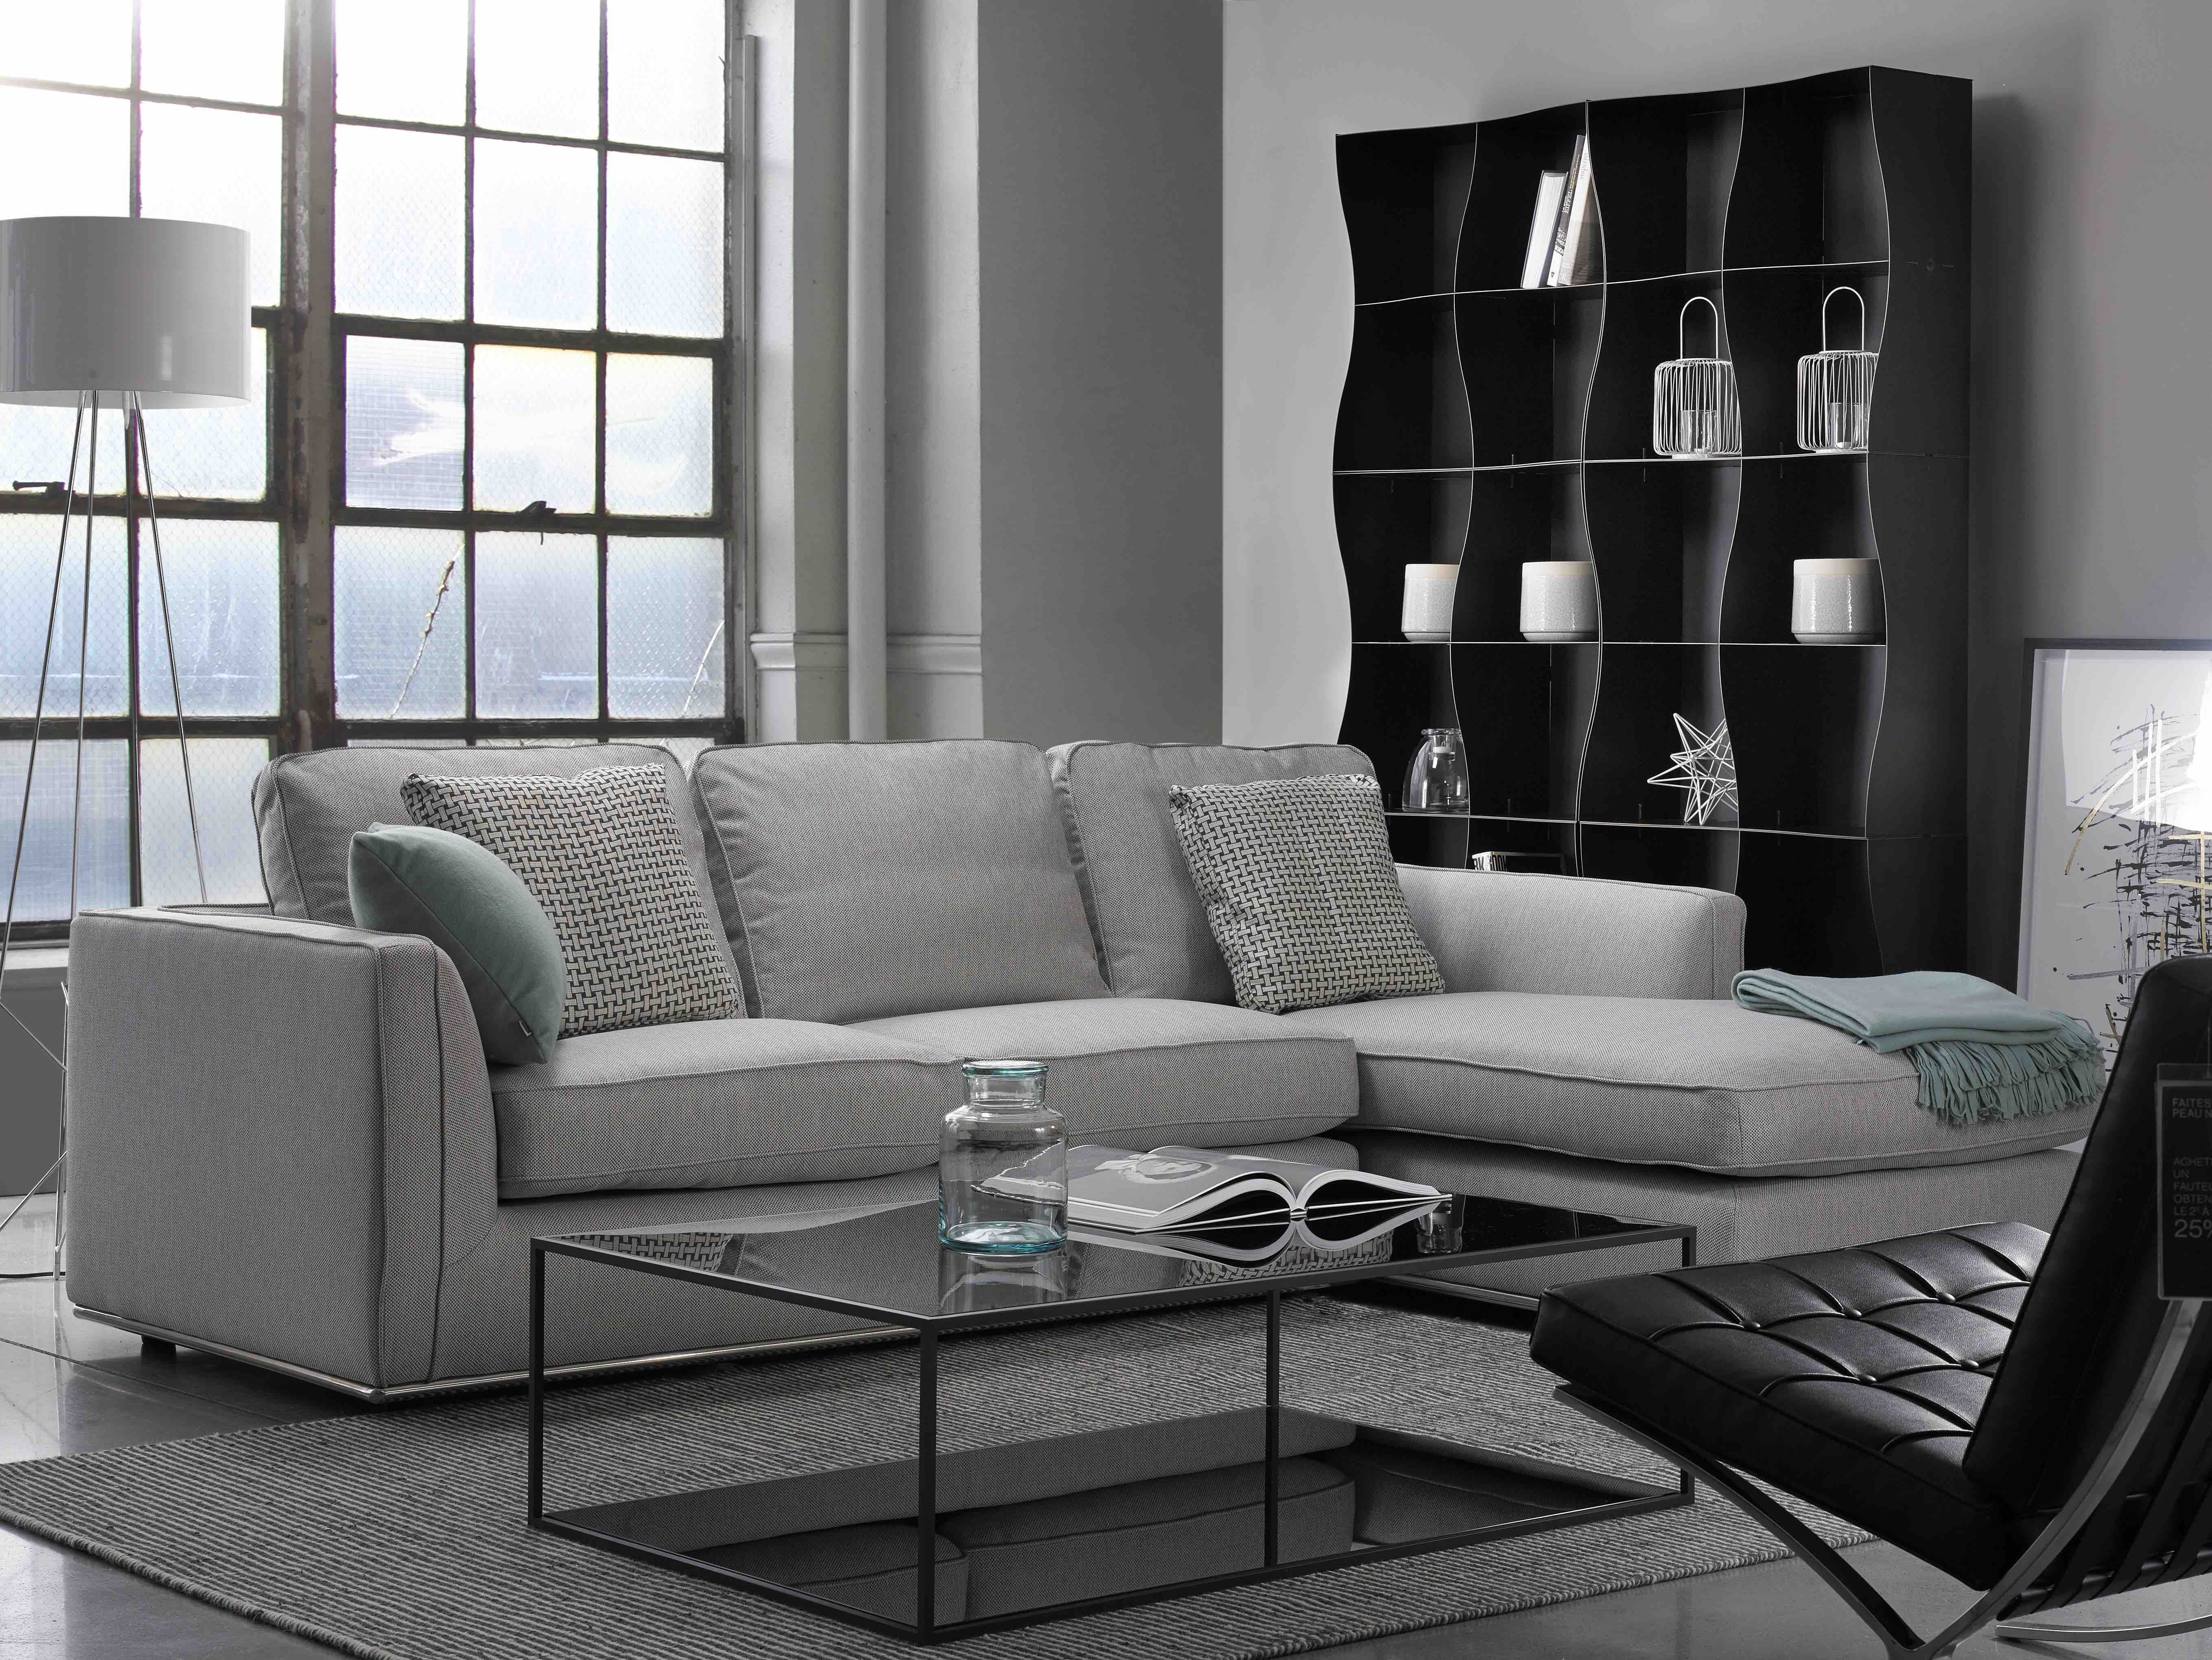 260bc0eac408f2cae89404b1f0ecf4ac Incroyable De Table Basse Le Corbusier Concept